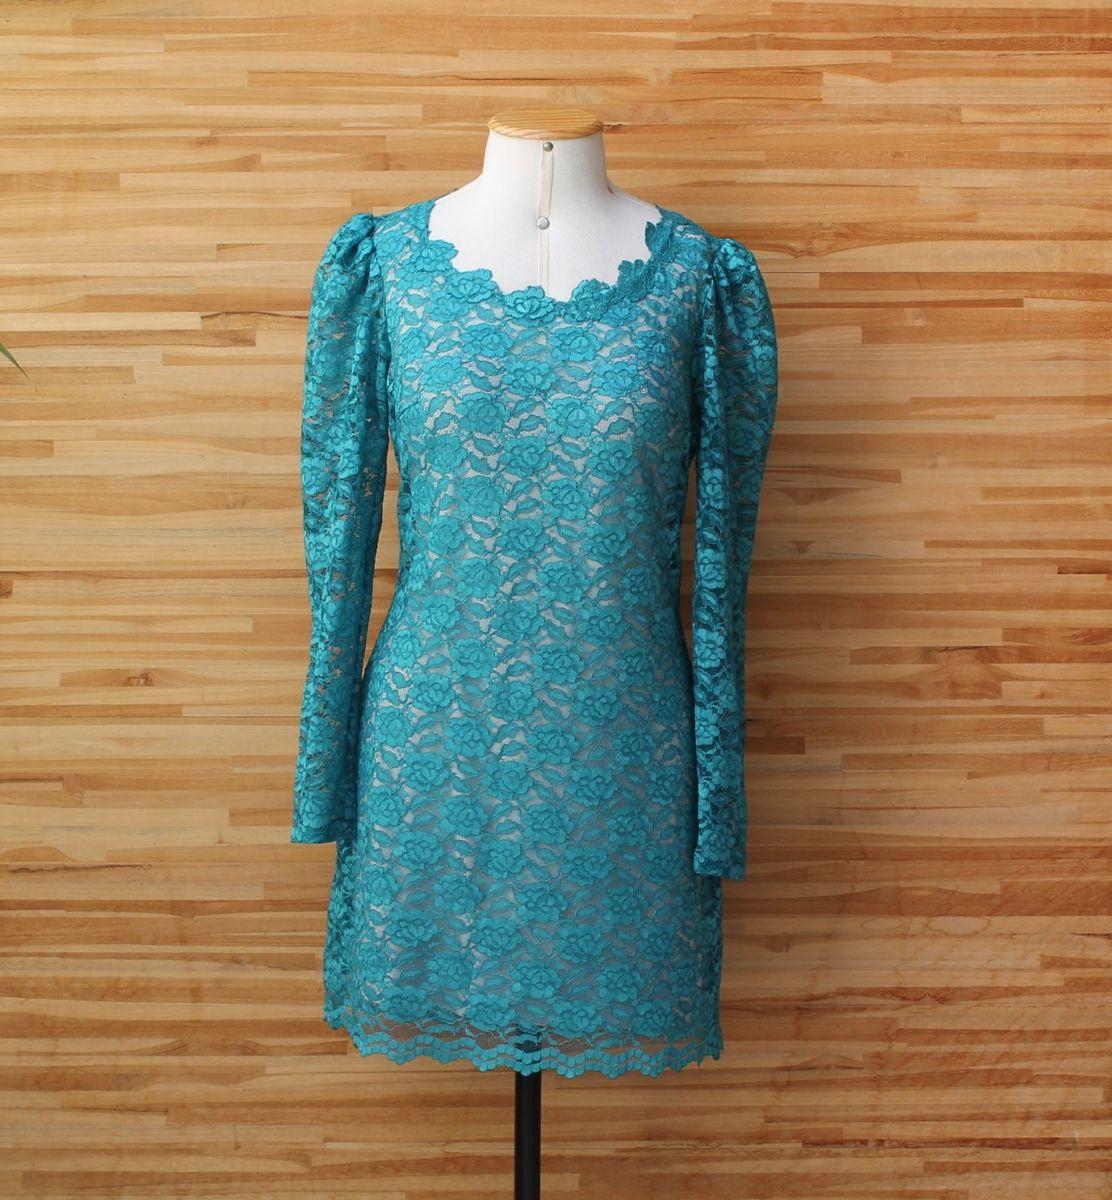 Vestido azul piscina renda